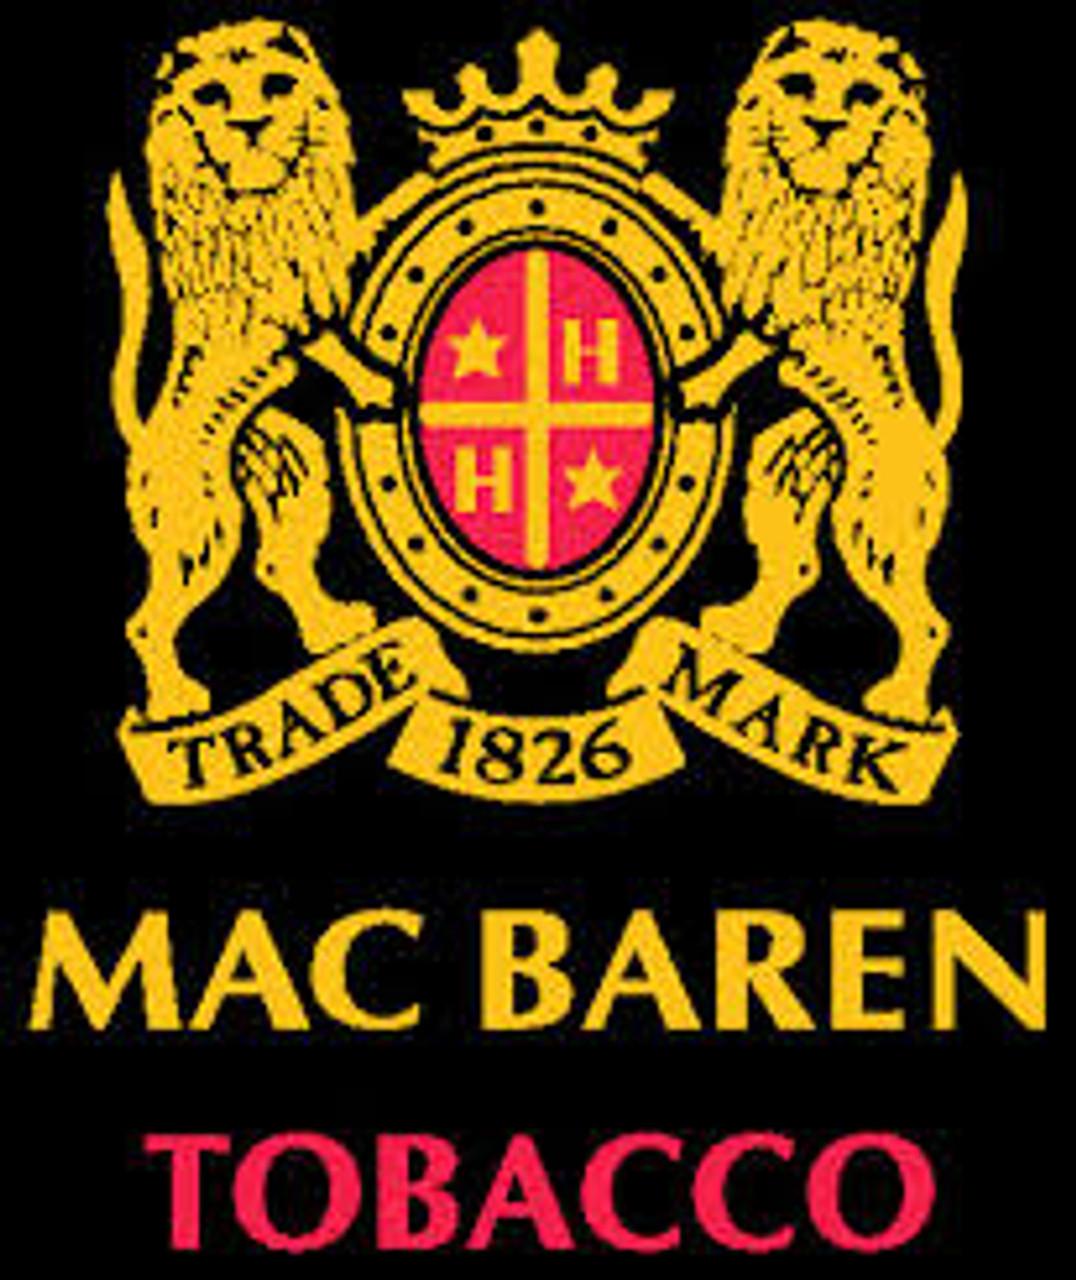 Mac Baren Golden Extra Pipe Tobacco   16 OZ BAG